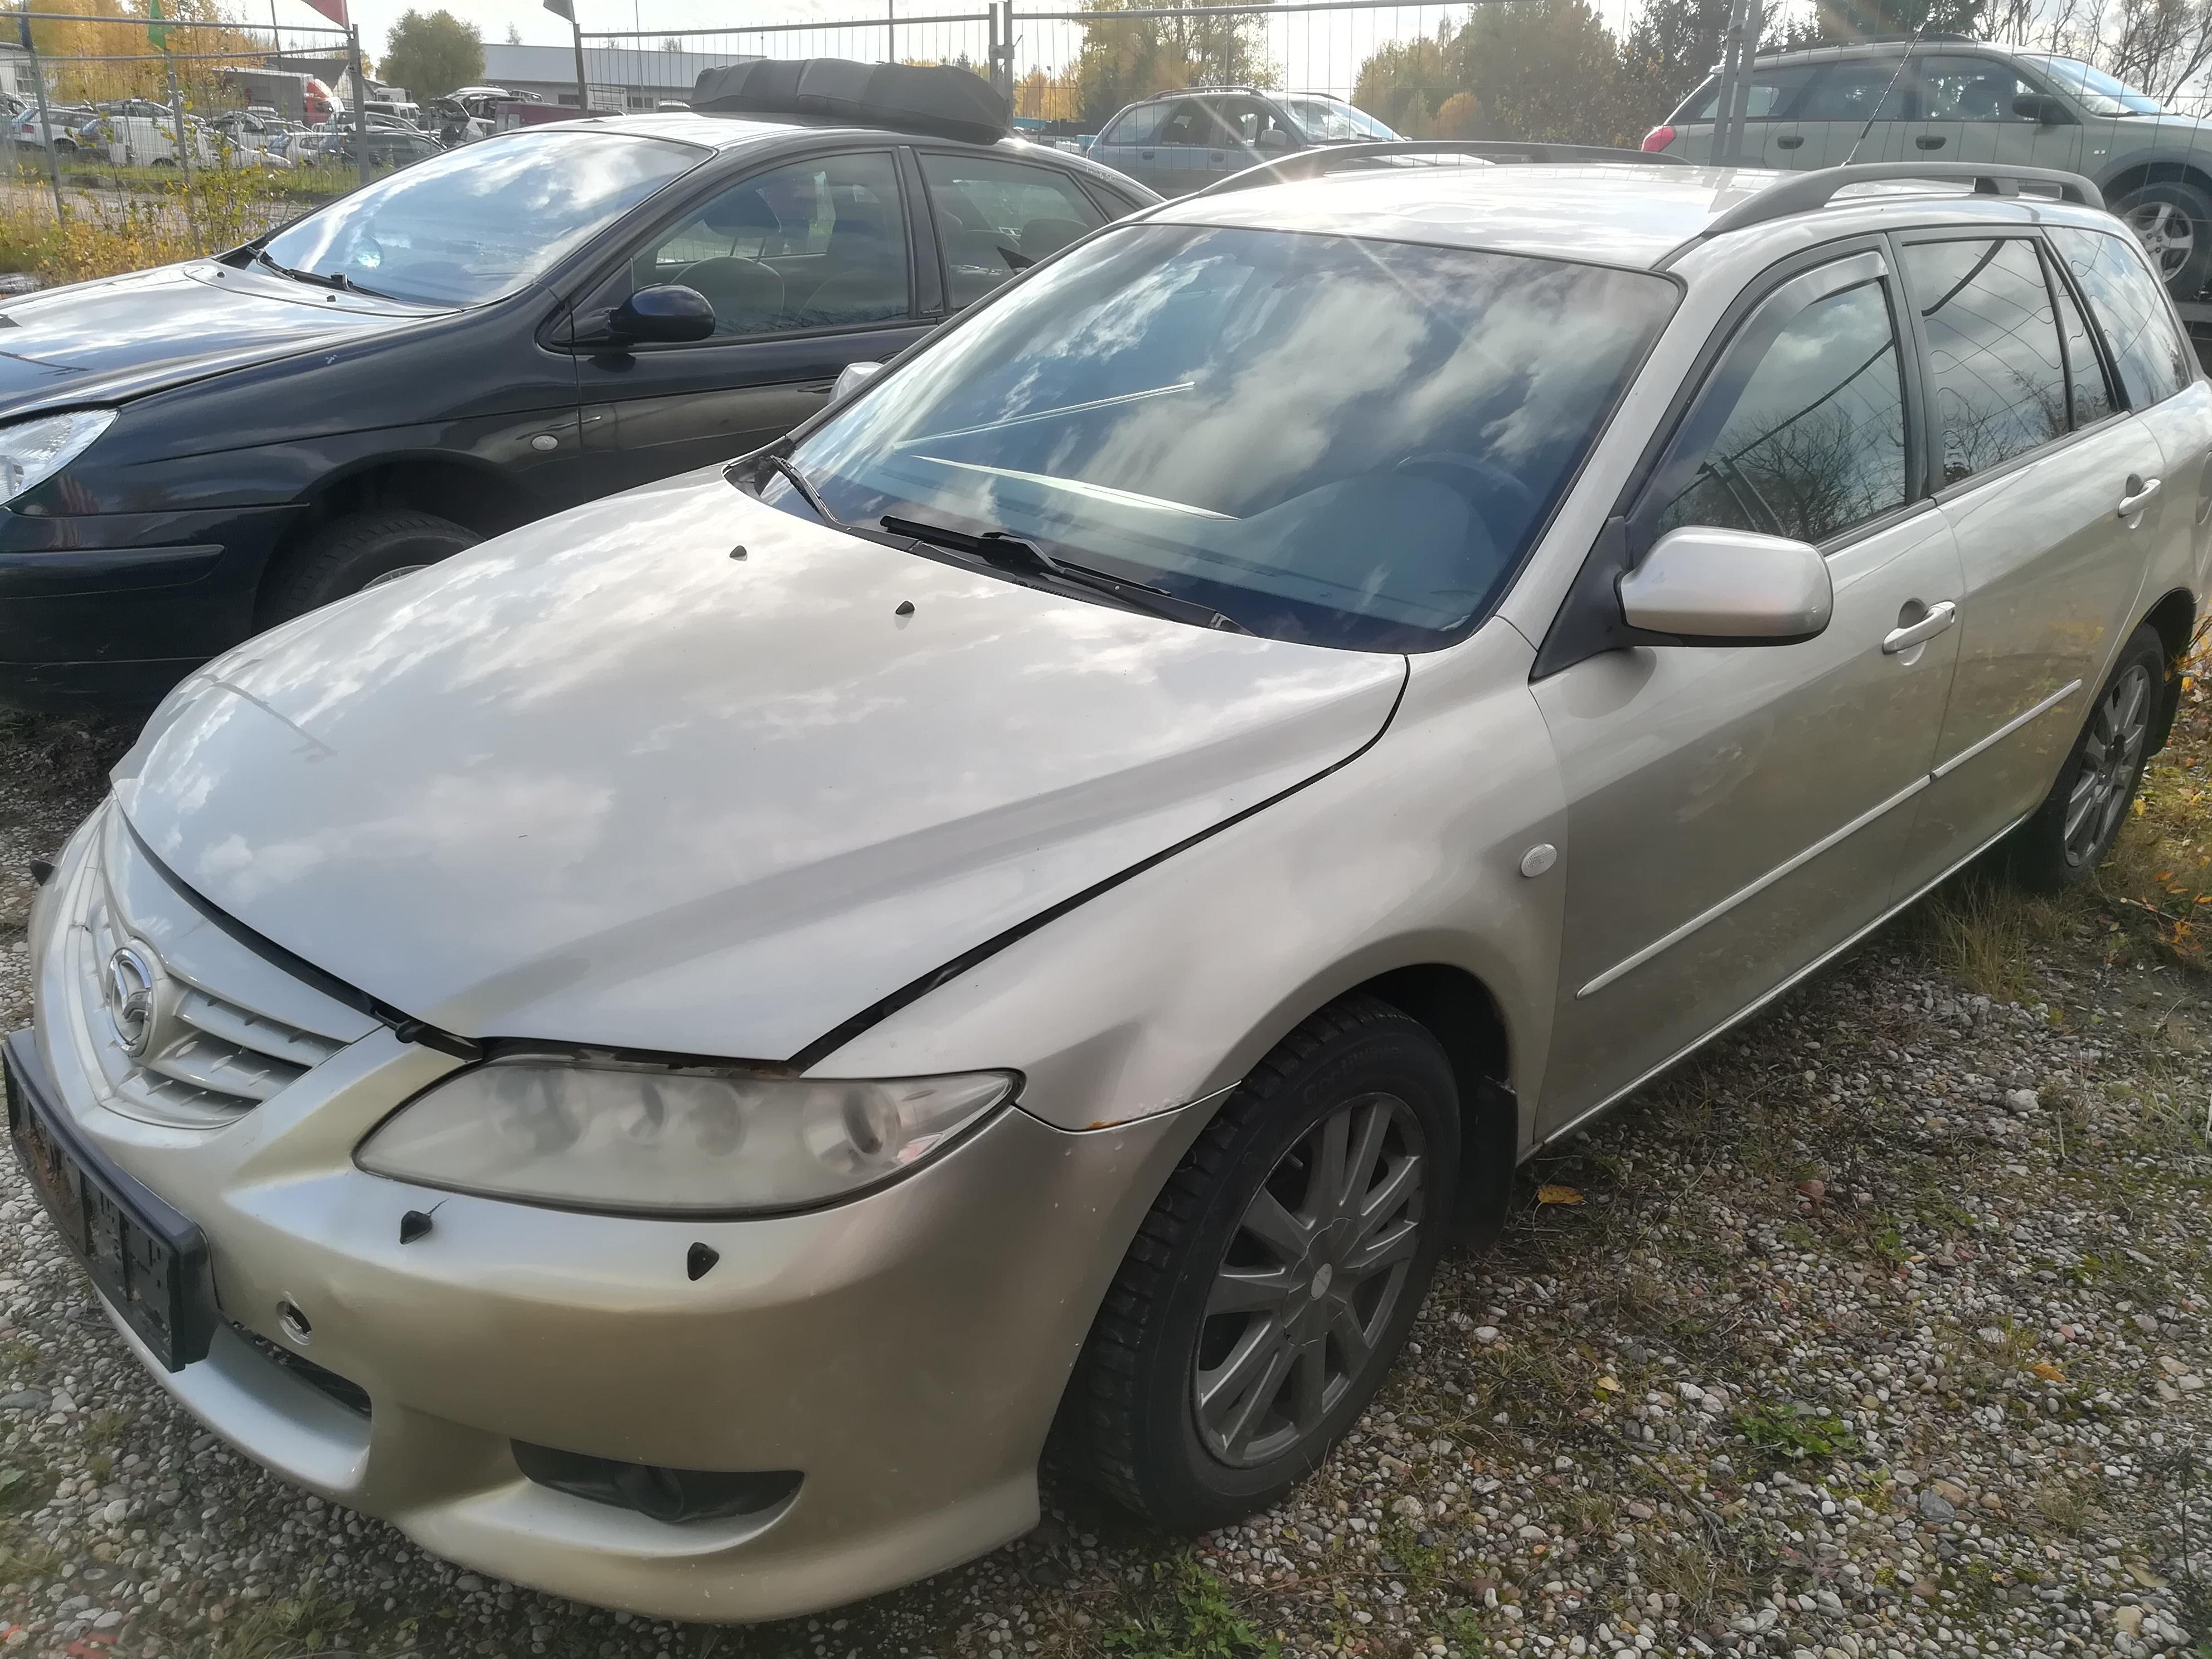 Foto-4 Mazda 6 6, 2002.06 - 2007.08 2005 Benzinas 2.0